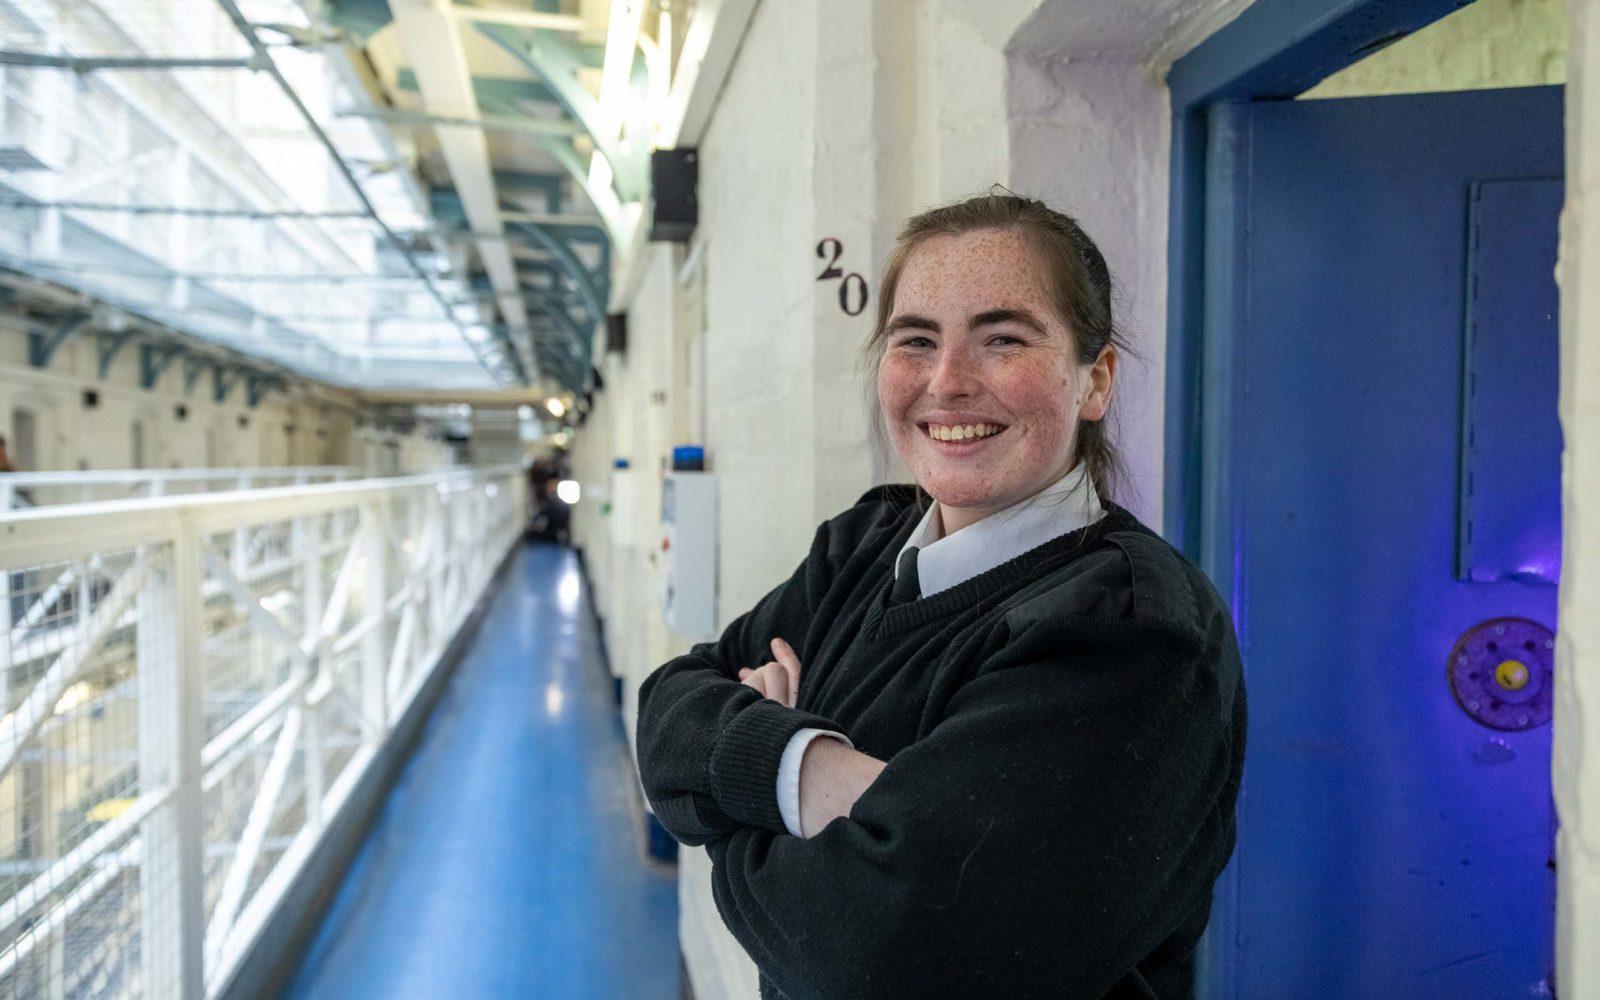 Shrewsbury Prison Special Educational Needs | Shrewsbury Prison SEN Trips